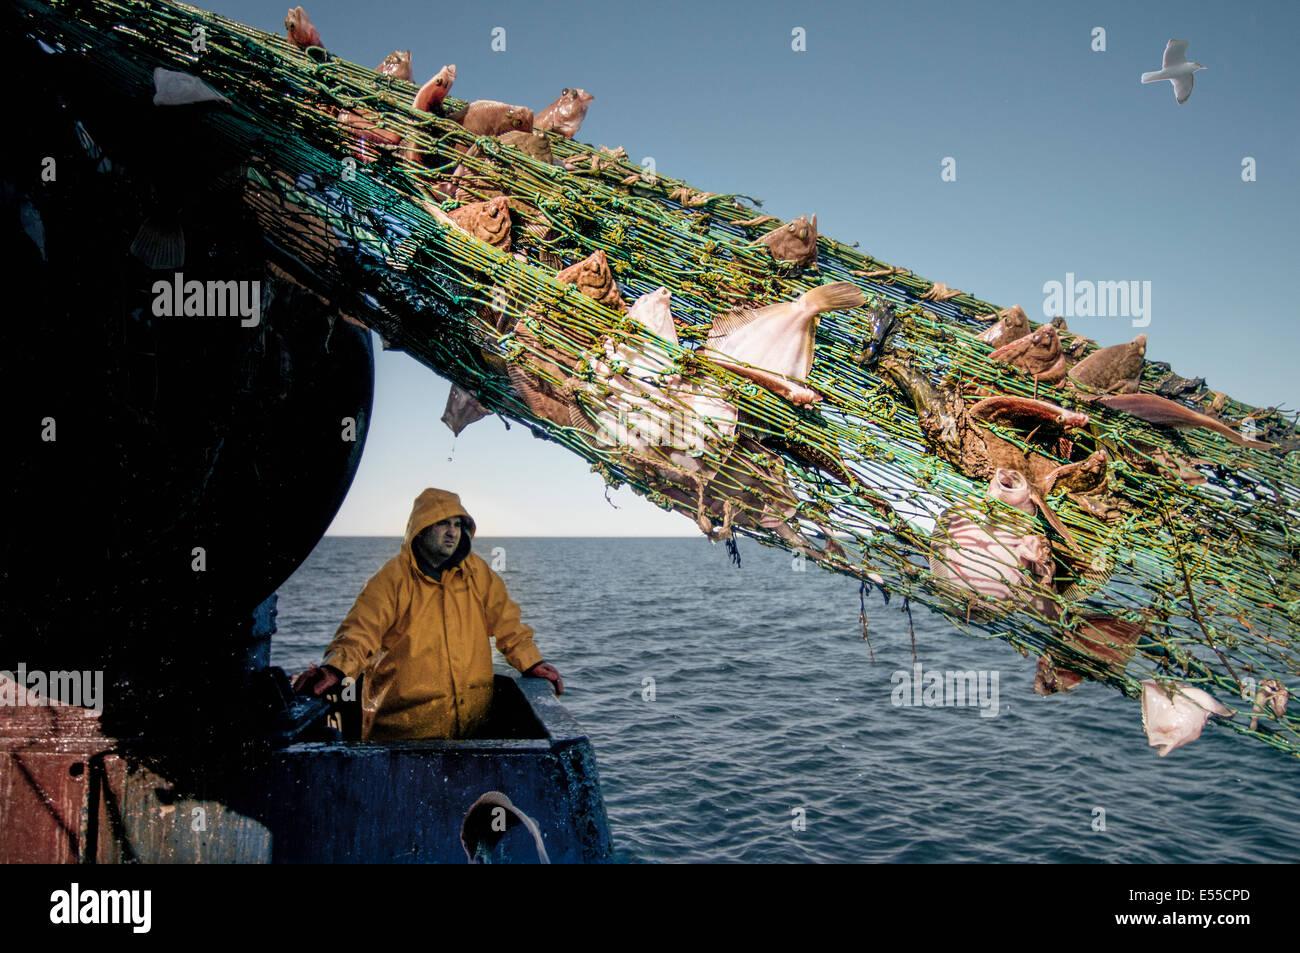 Fisherman hauling back dragger net on fishing trawler. Stellwagen Banks, New England, United States, North Atlantic Ocean. Stock Photo